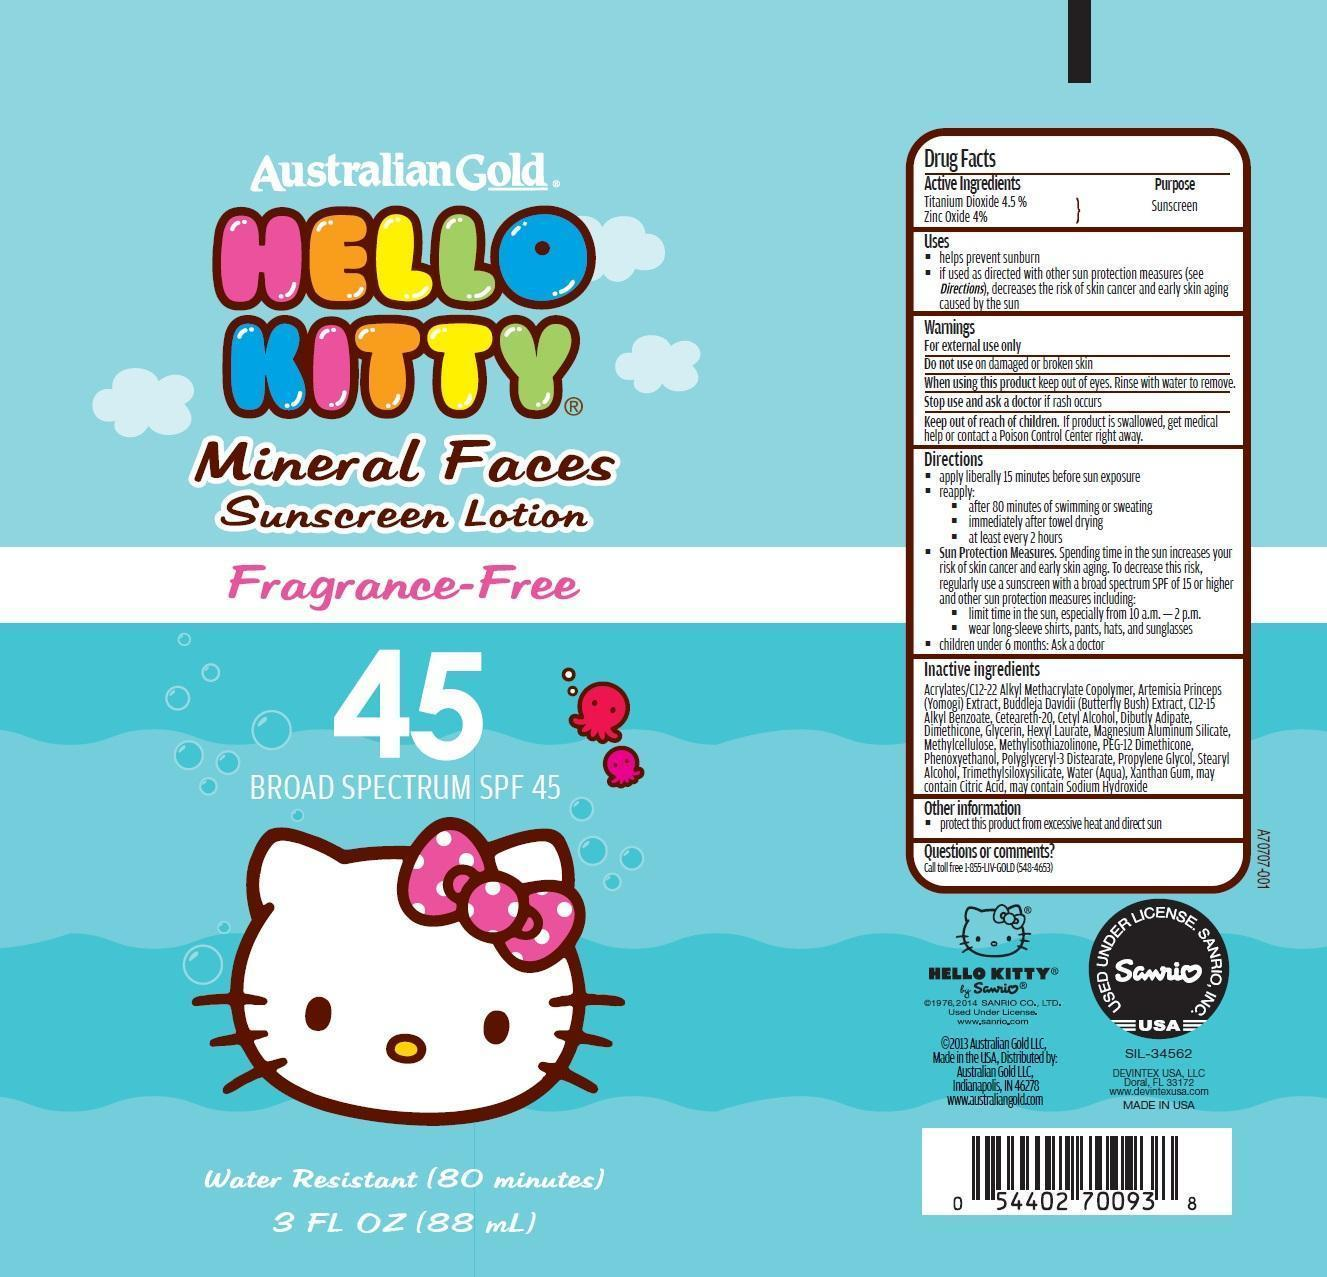 Australian Gold Hello Kitty Broad Spectrum Spf 45 (Titanium Dioxide And Zinc Oxide) Lotion [Prime Enterprises, Inc.]